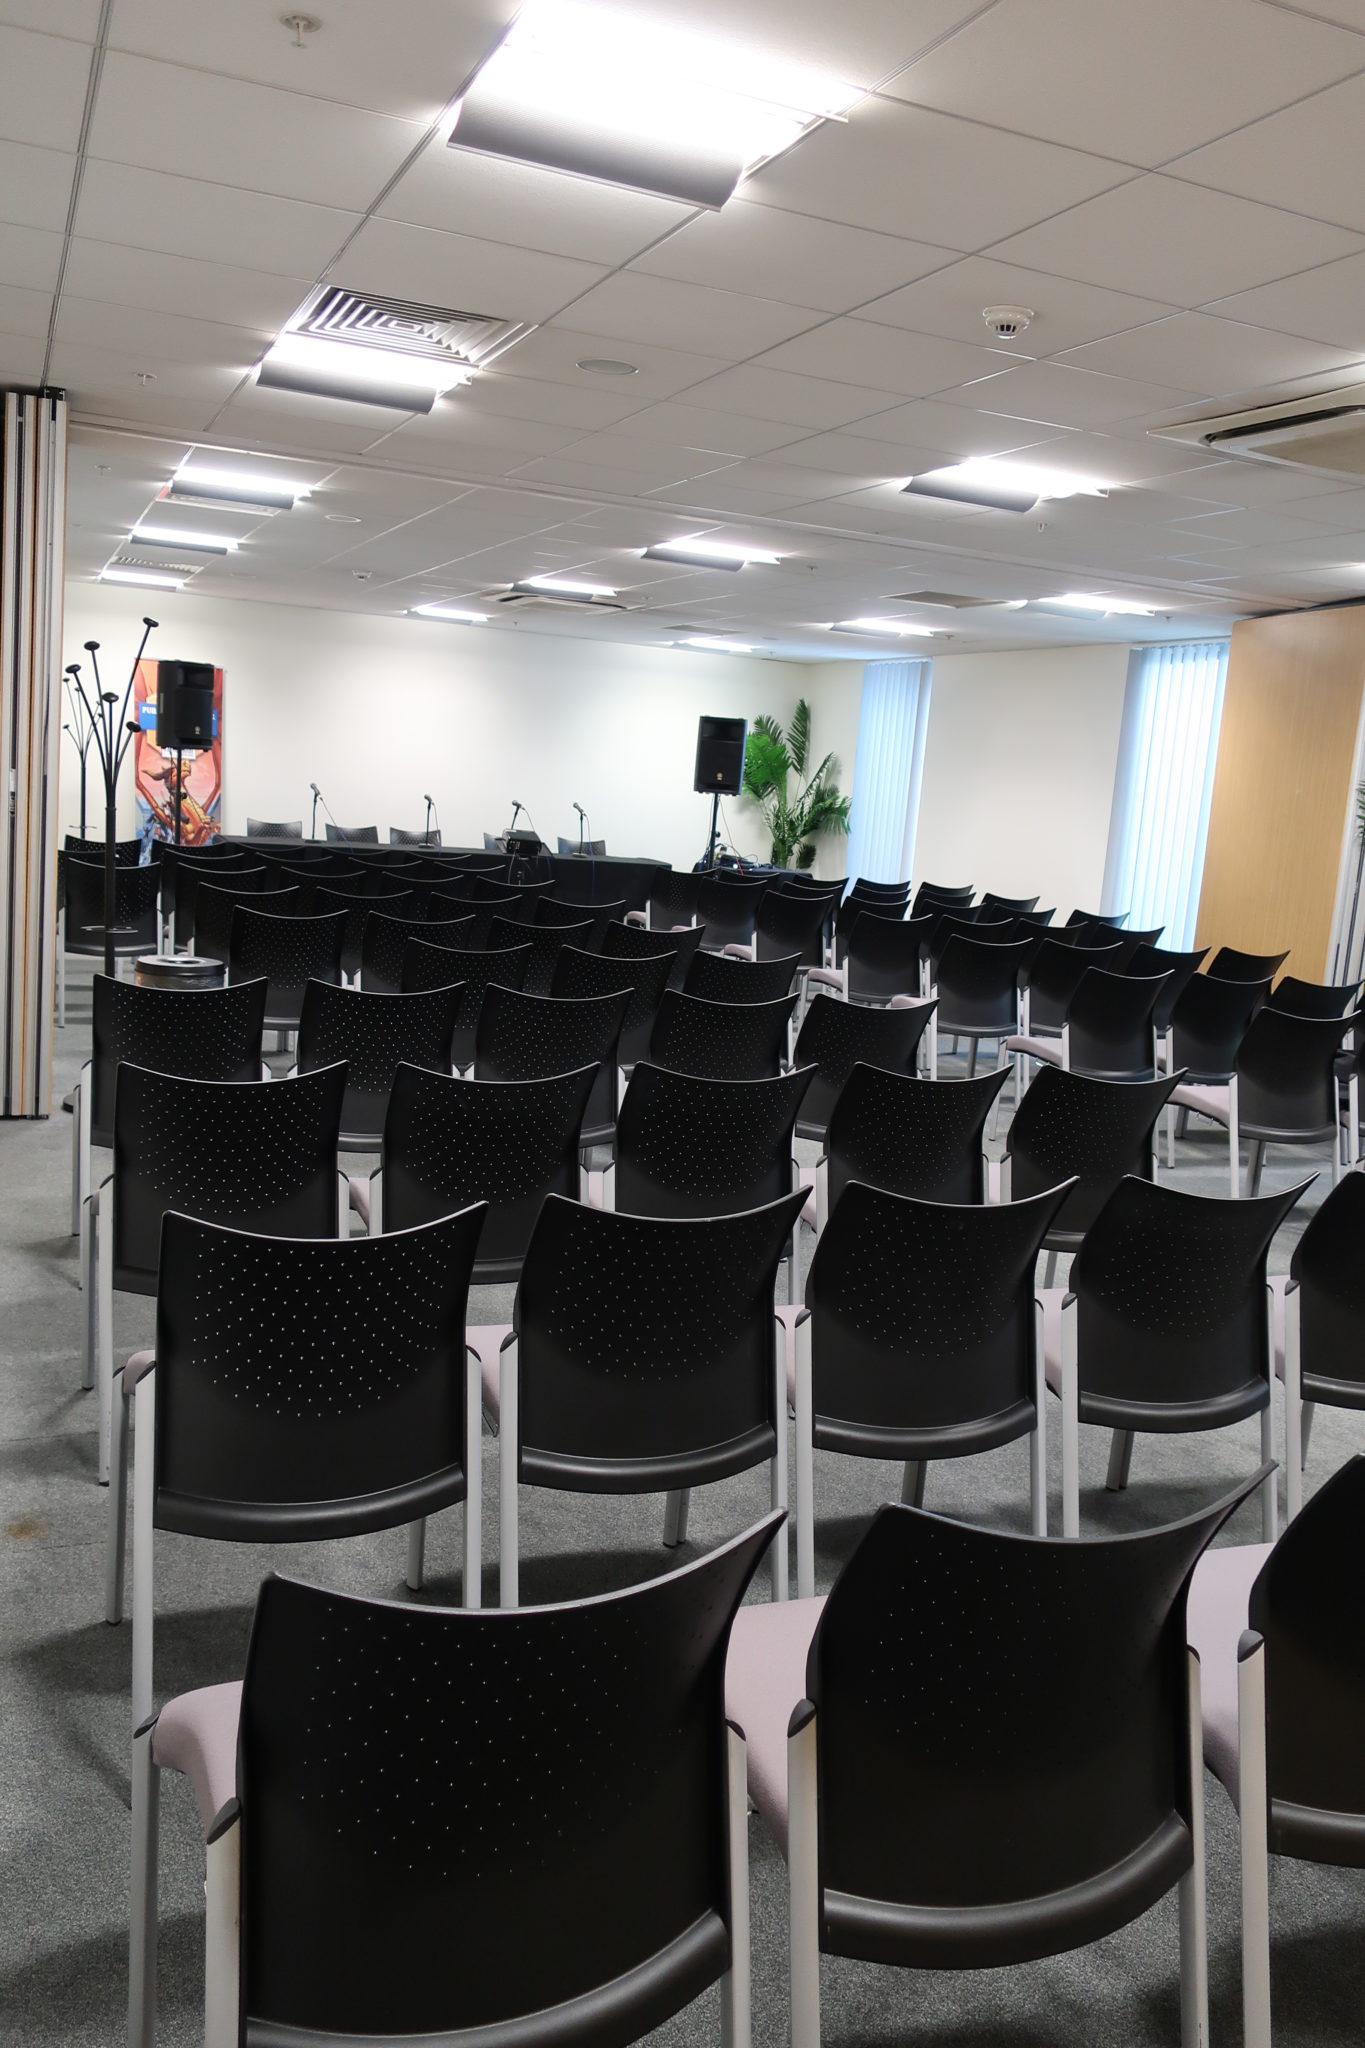 The seminar room